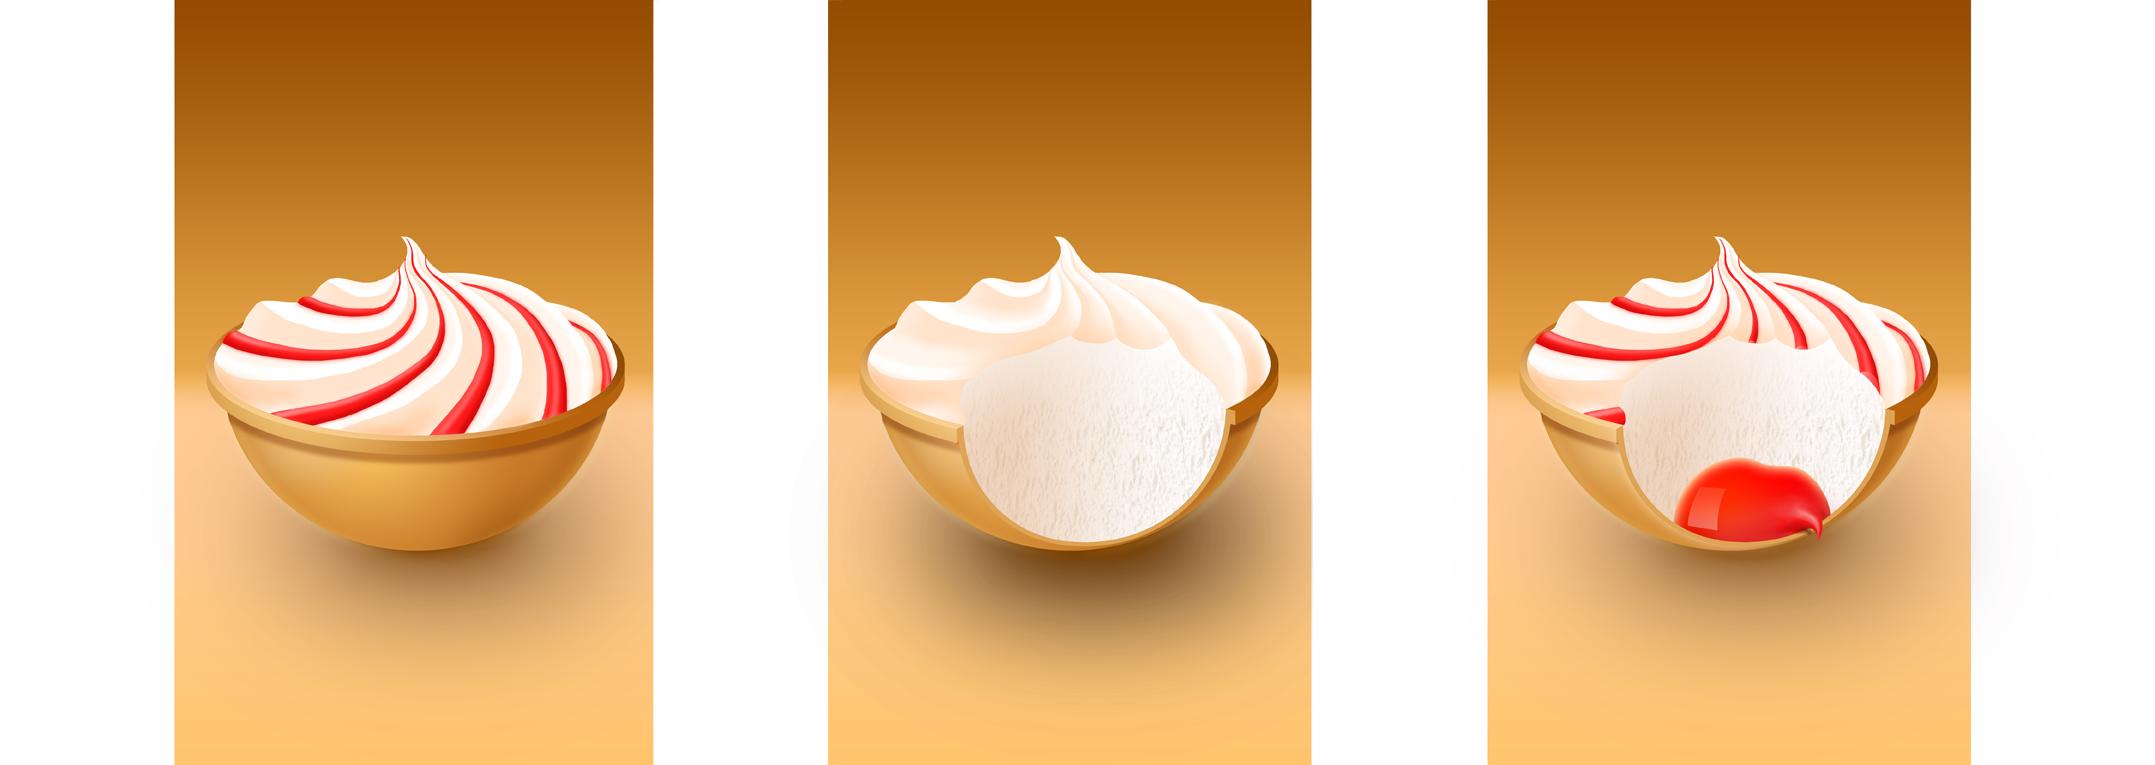 Moronello (форма)